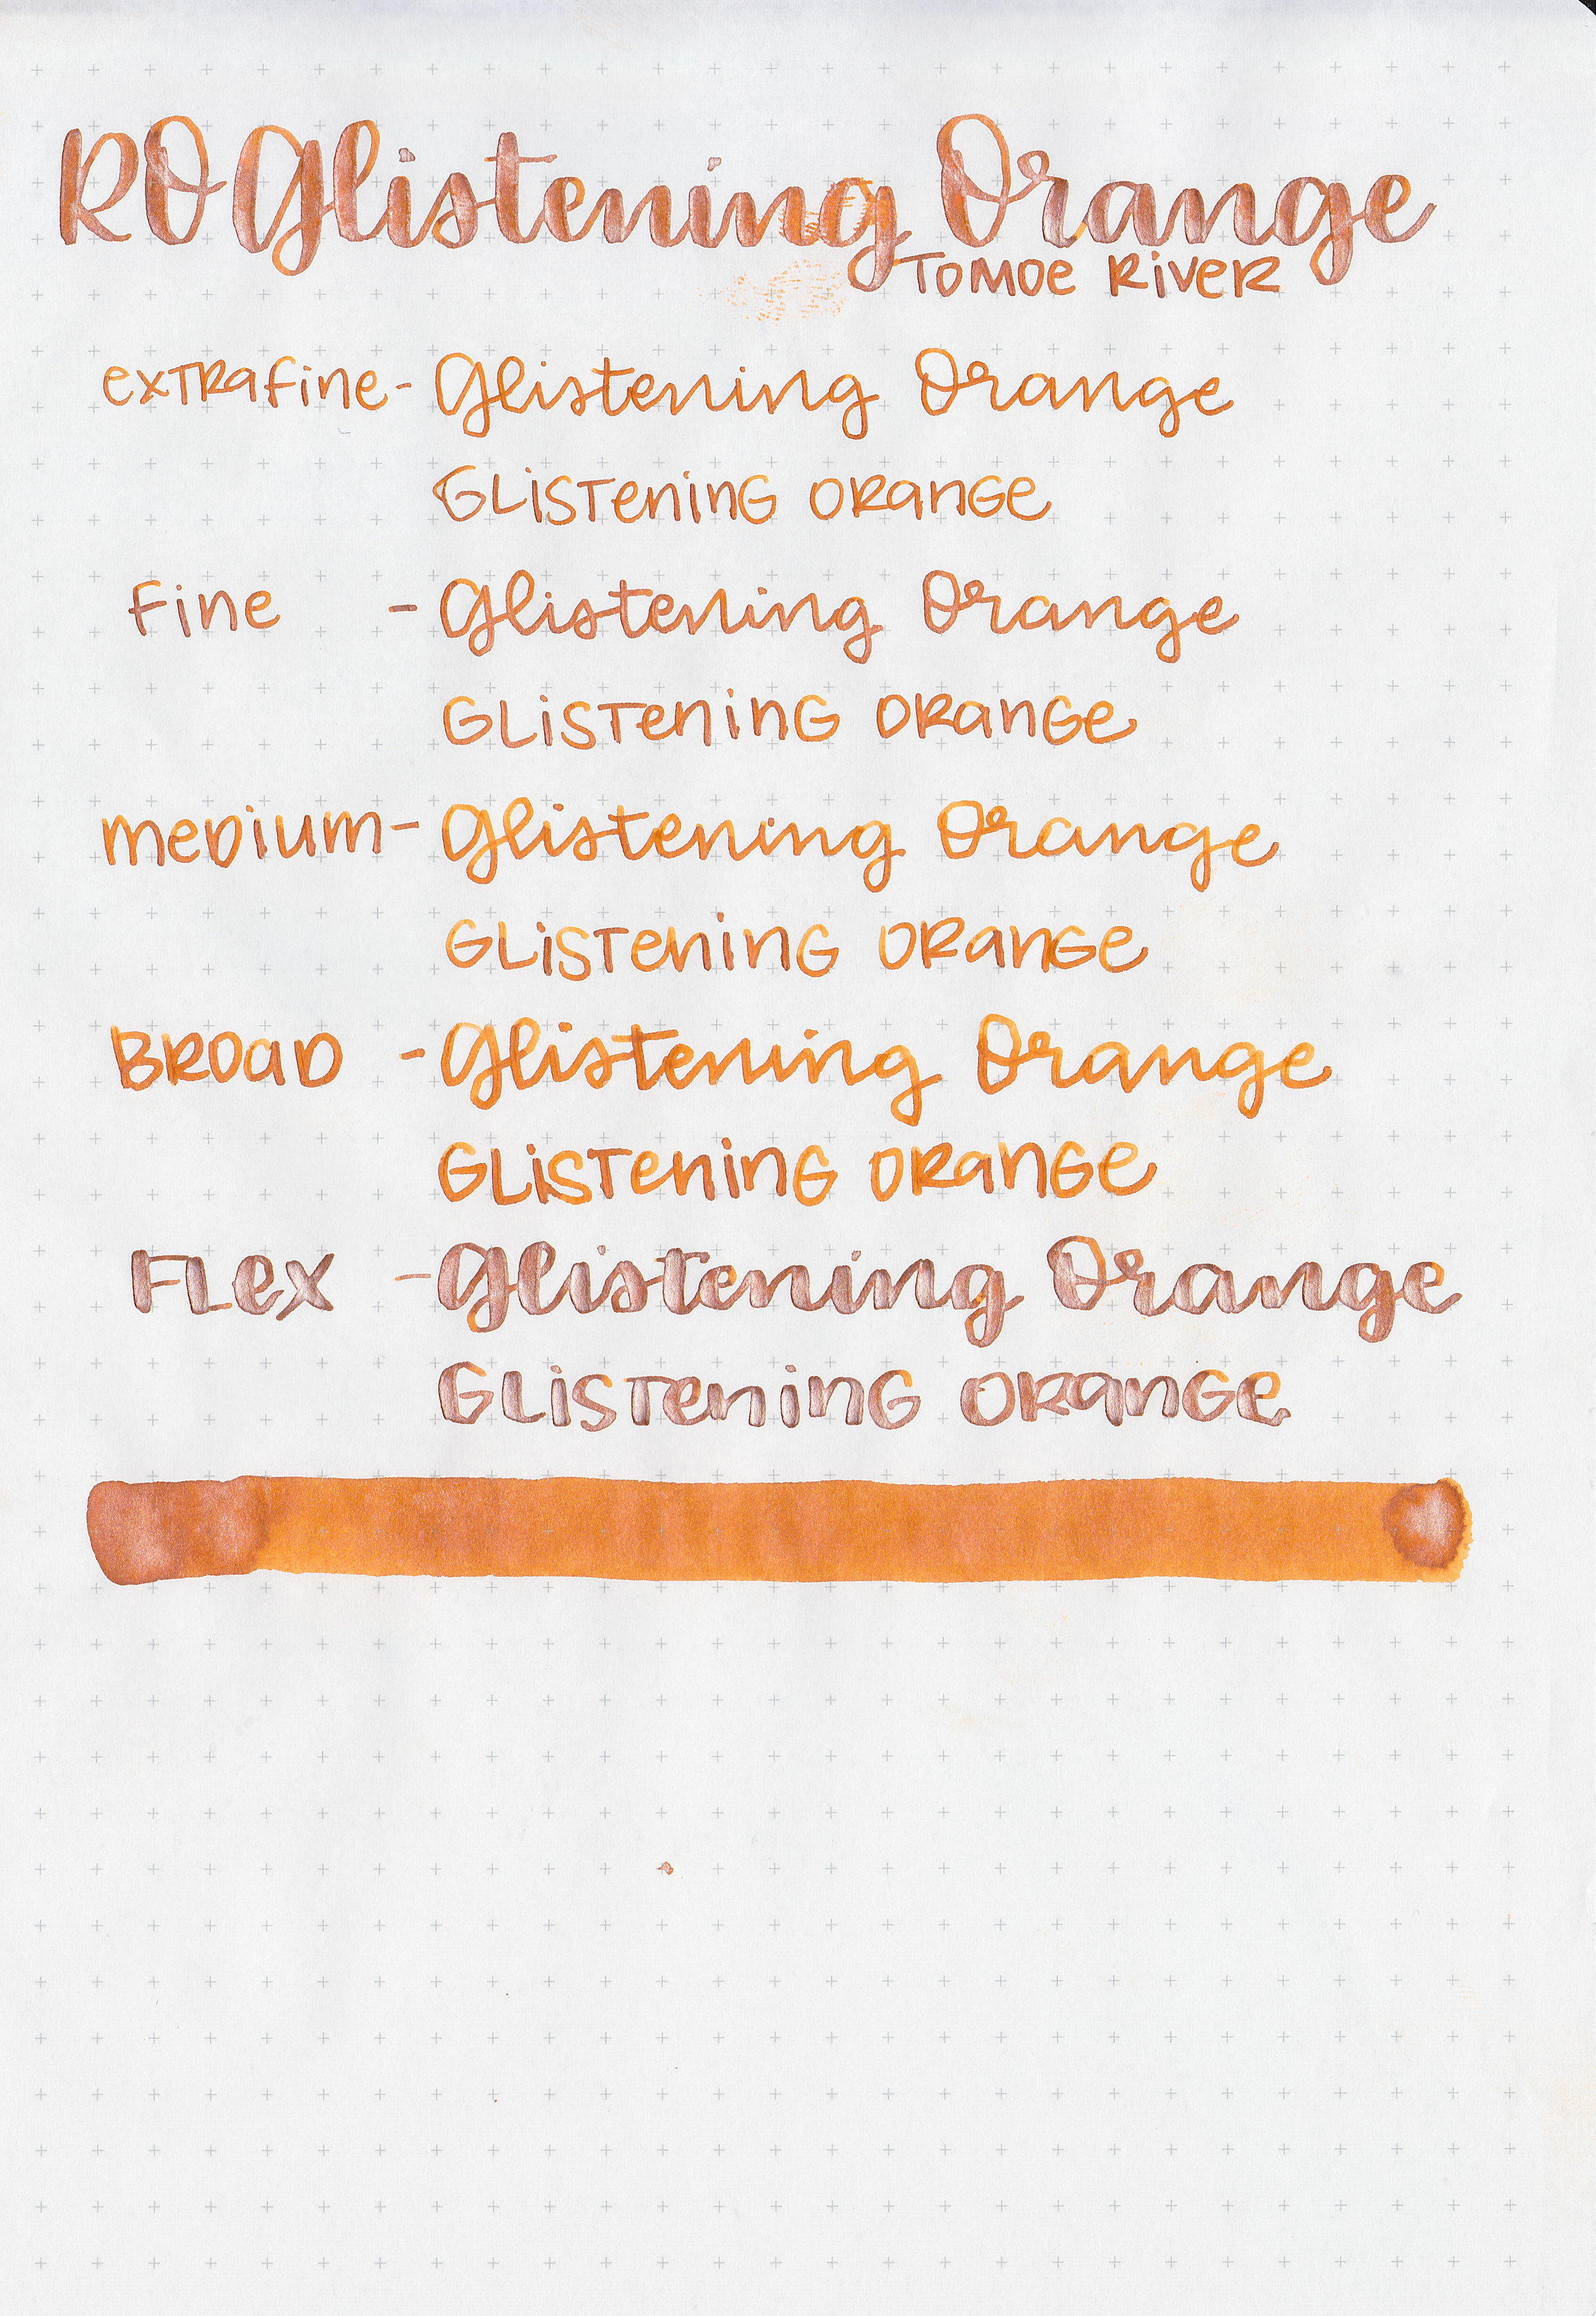 ro-glistening-orange-rumble-10.jpg